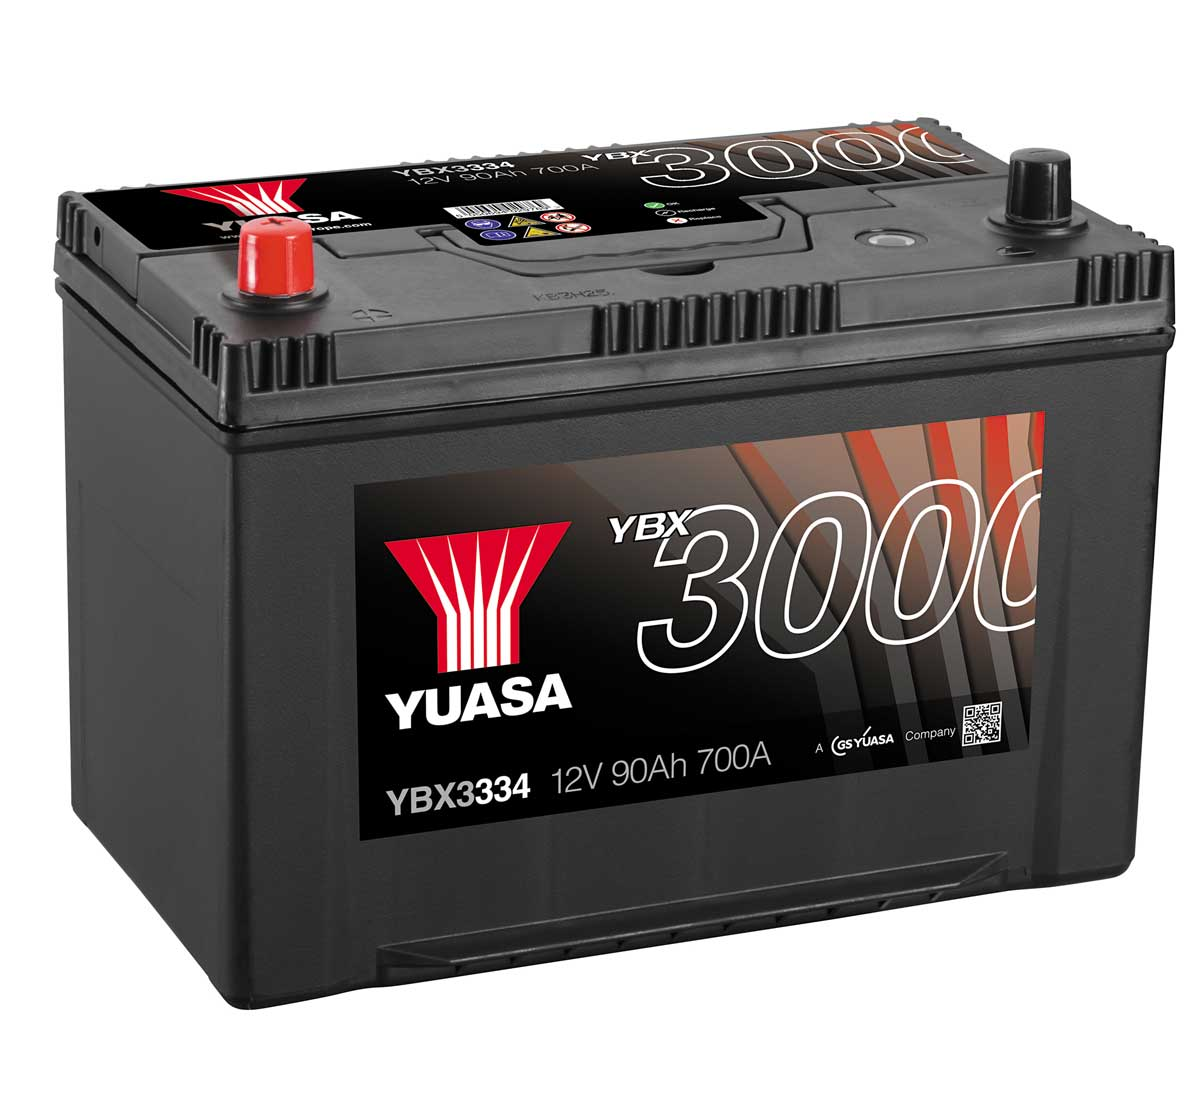 yuasa ybx3334 12v car battery mds battery. Black Bedroom Furniture Sets. Home Design Ideas